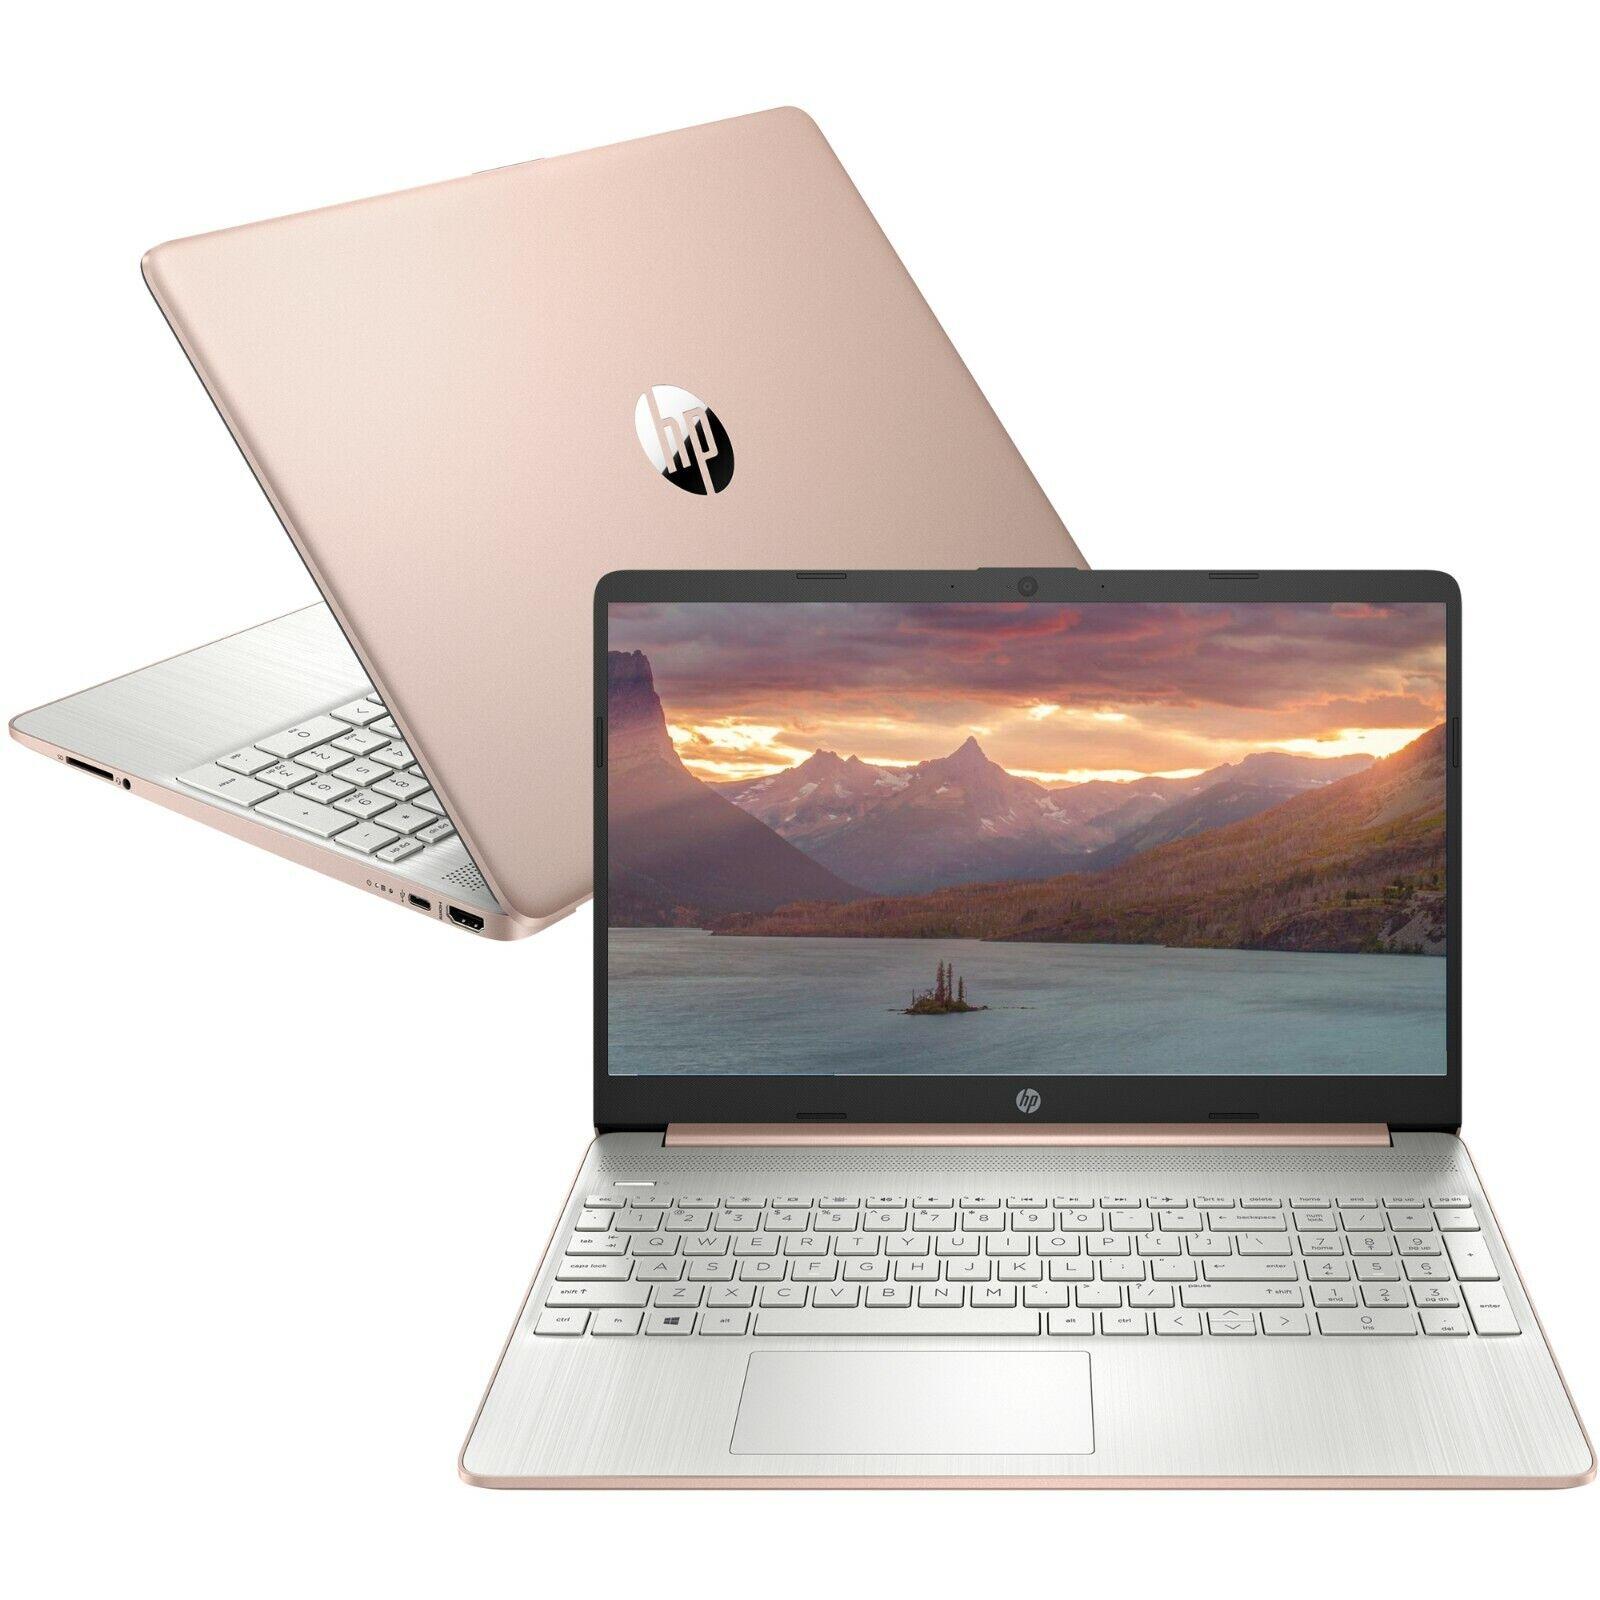 Laptop Windows - HP 15.6 HD AMD Quad Core Ryzen 5 3.7GHz 256GB SSD 8GB RAM Webcam Windows 10 Gold